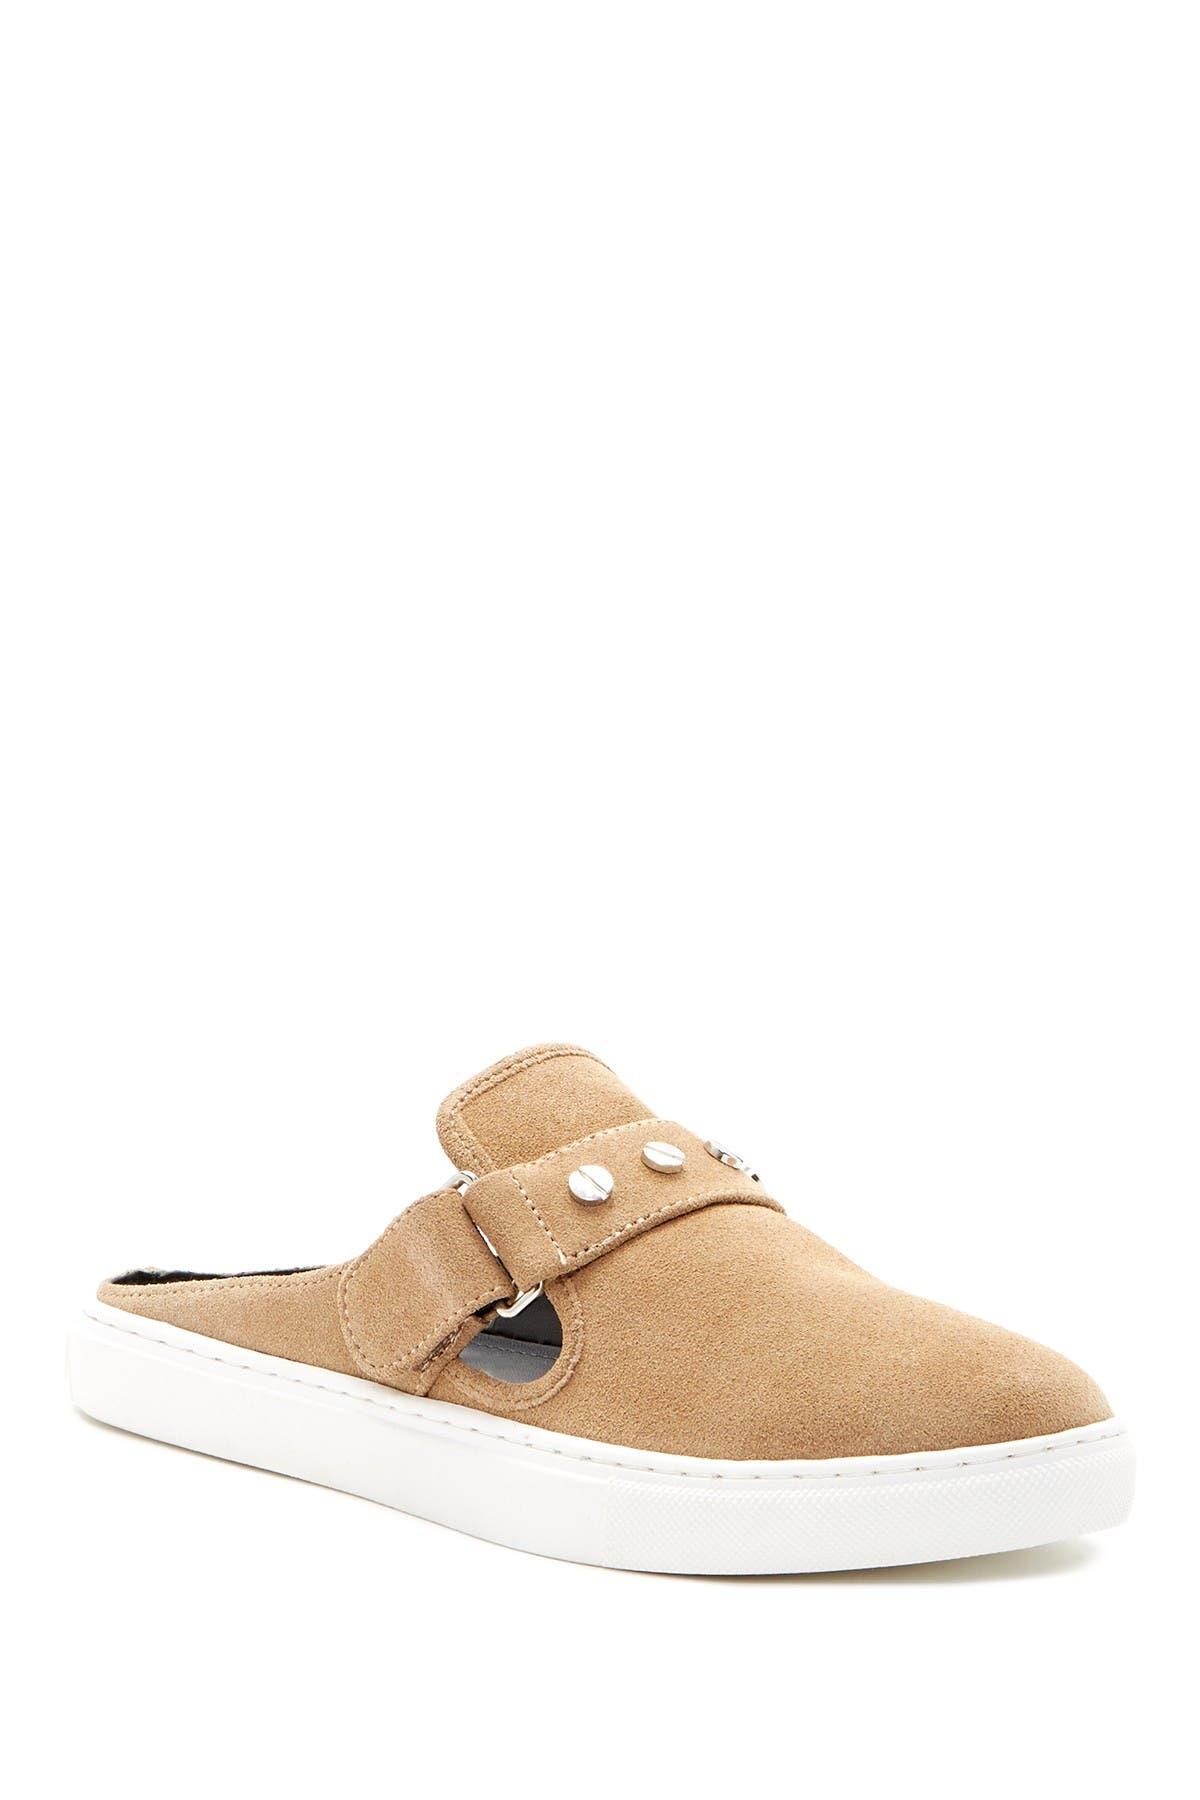 Rebecca Minkoff   Sonia Slip-On Sneaker